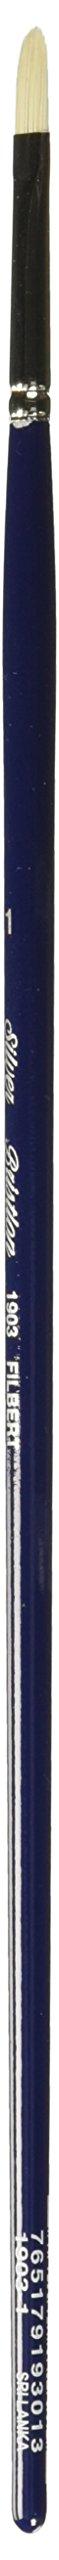 Silver Brush 1903-1 Bristlon Stiff Synthetic Long Handle Filament Brush, Filbert, Size 1